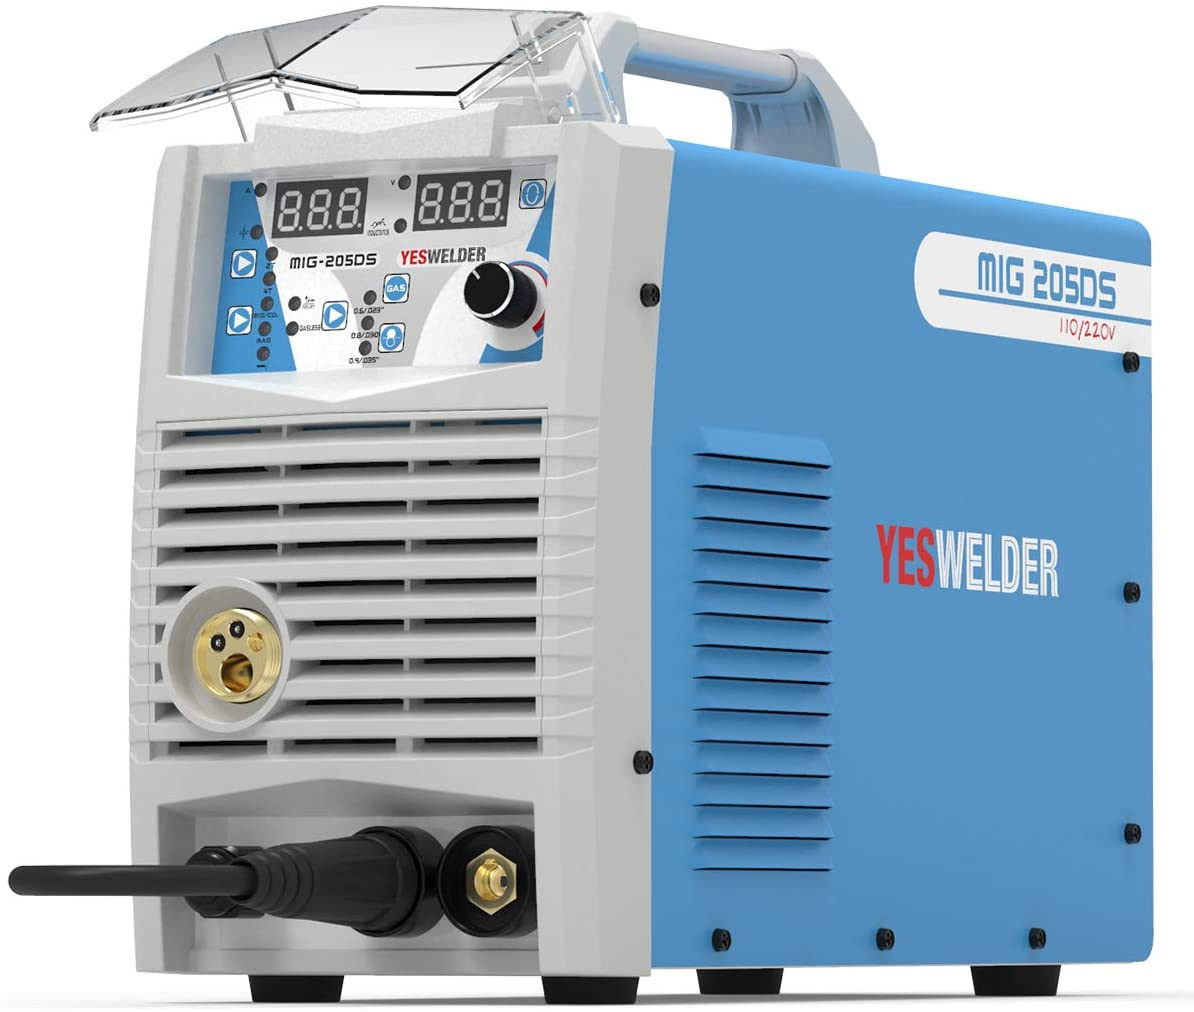 YESWELDER Digital MIG-205DS Welder